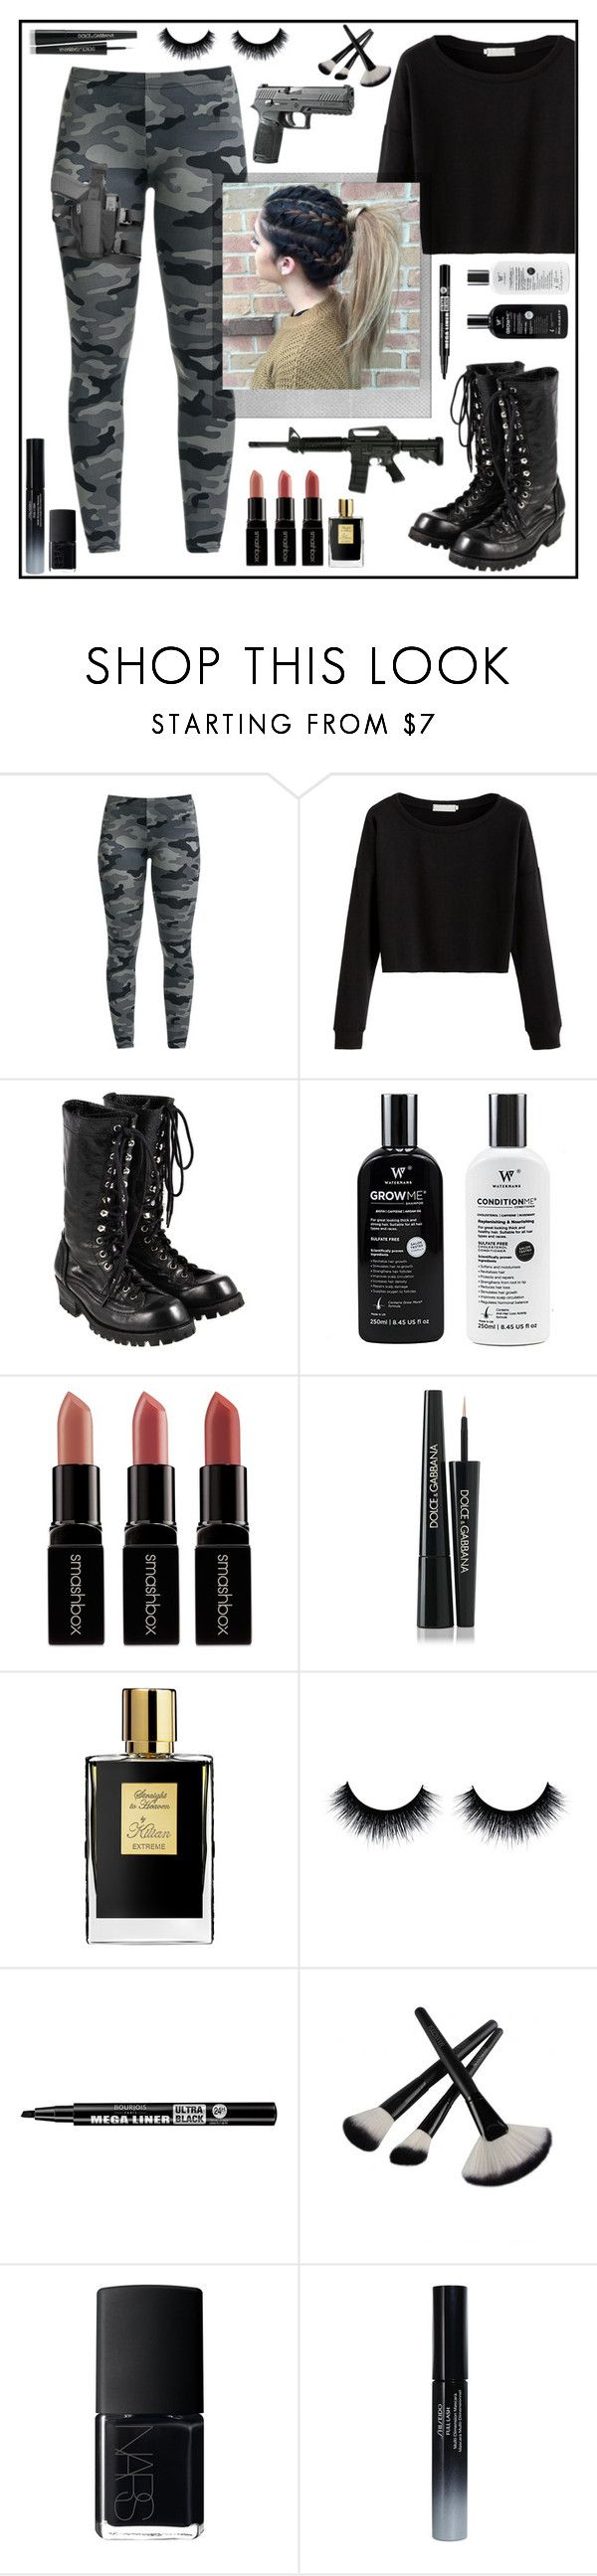 """Warrior Hair"" by janemorguedoe ❤ liked on Polyvore featuring Comme des Garçons, Polaroid, Smashbox, Dolce&Gabbana, Kilian, Bourjois, NARS Cosmetics and Shiseido"